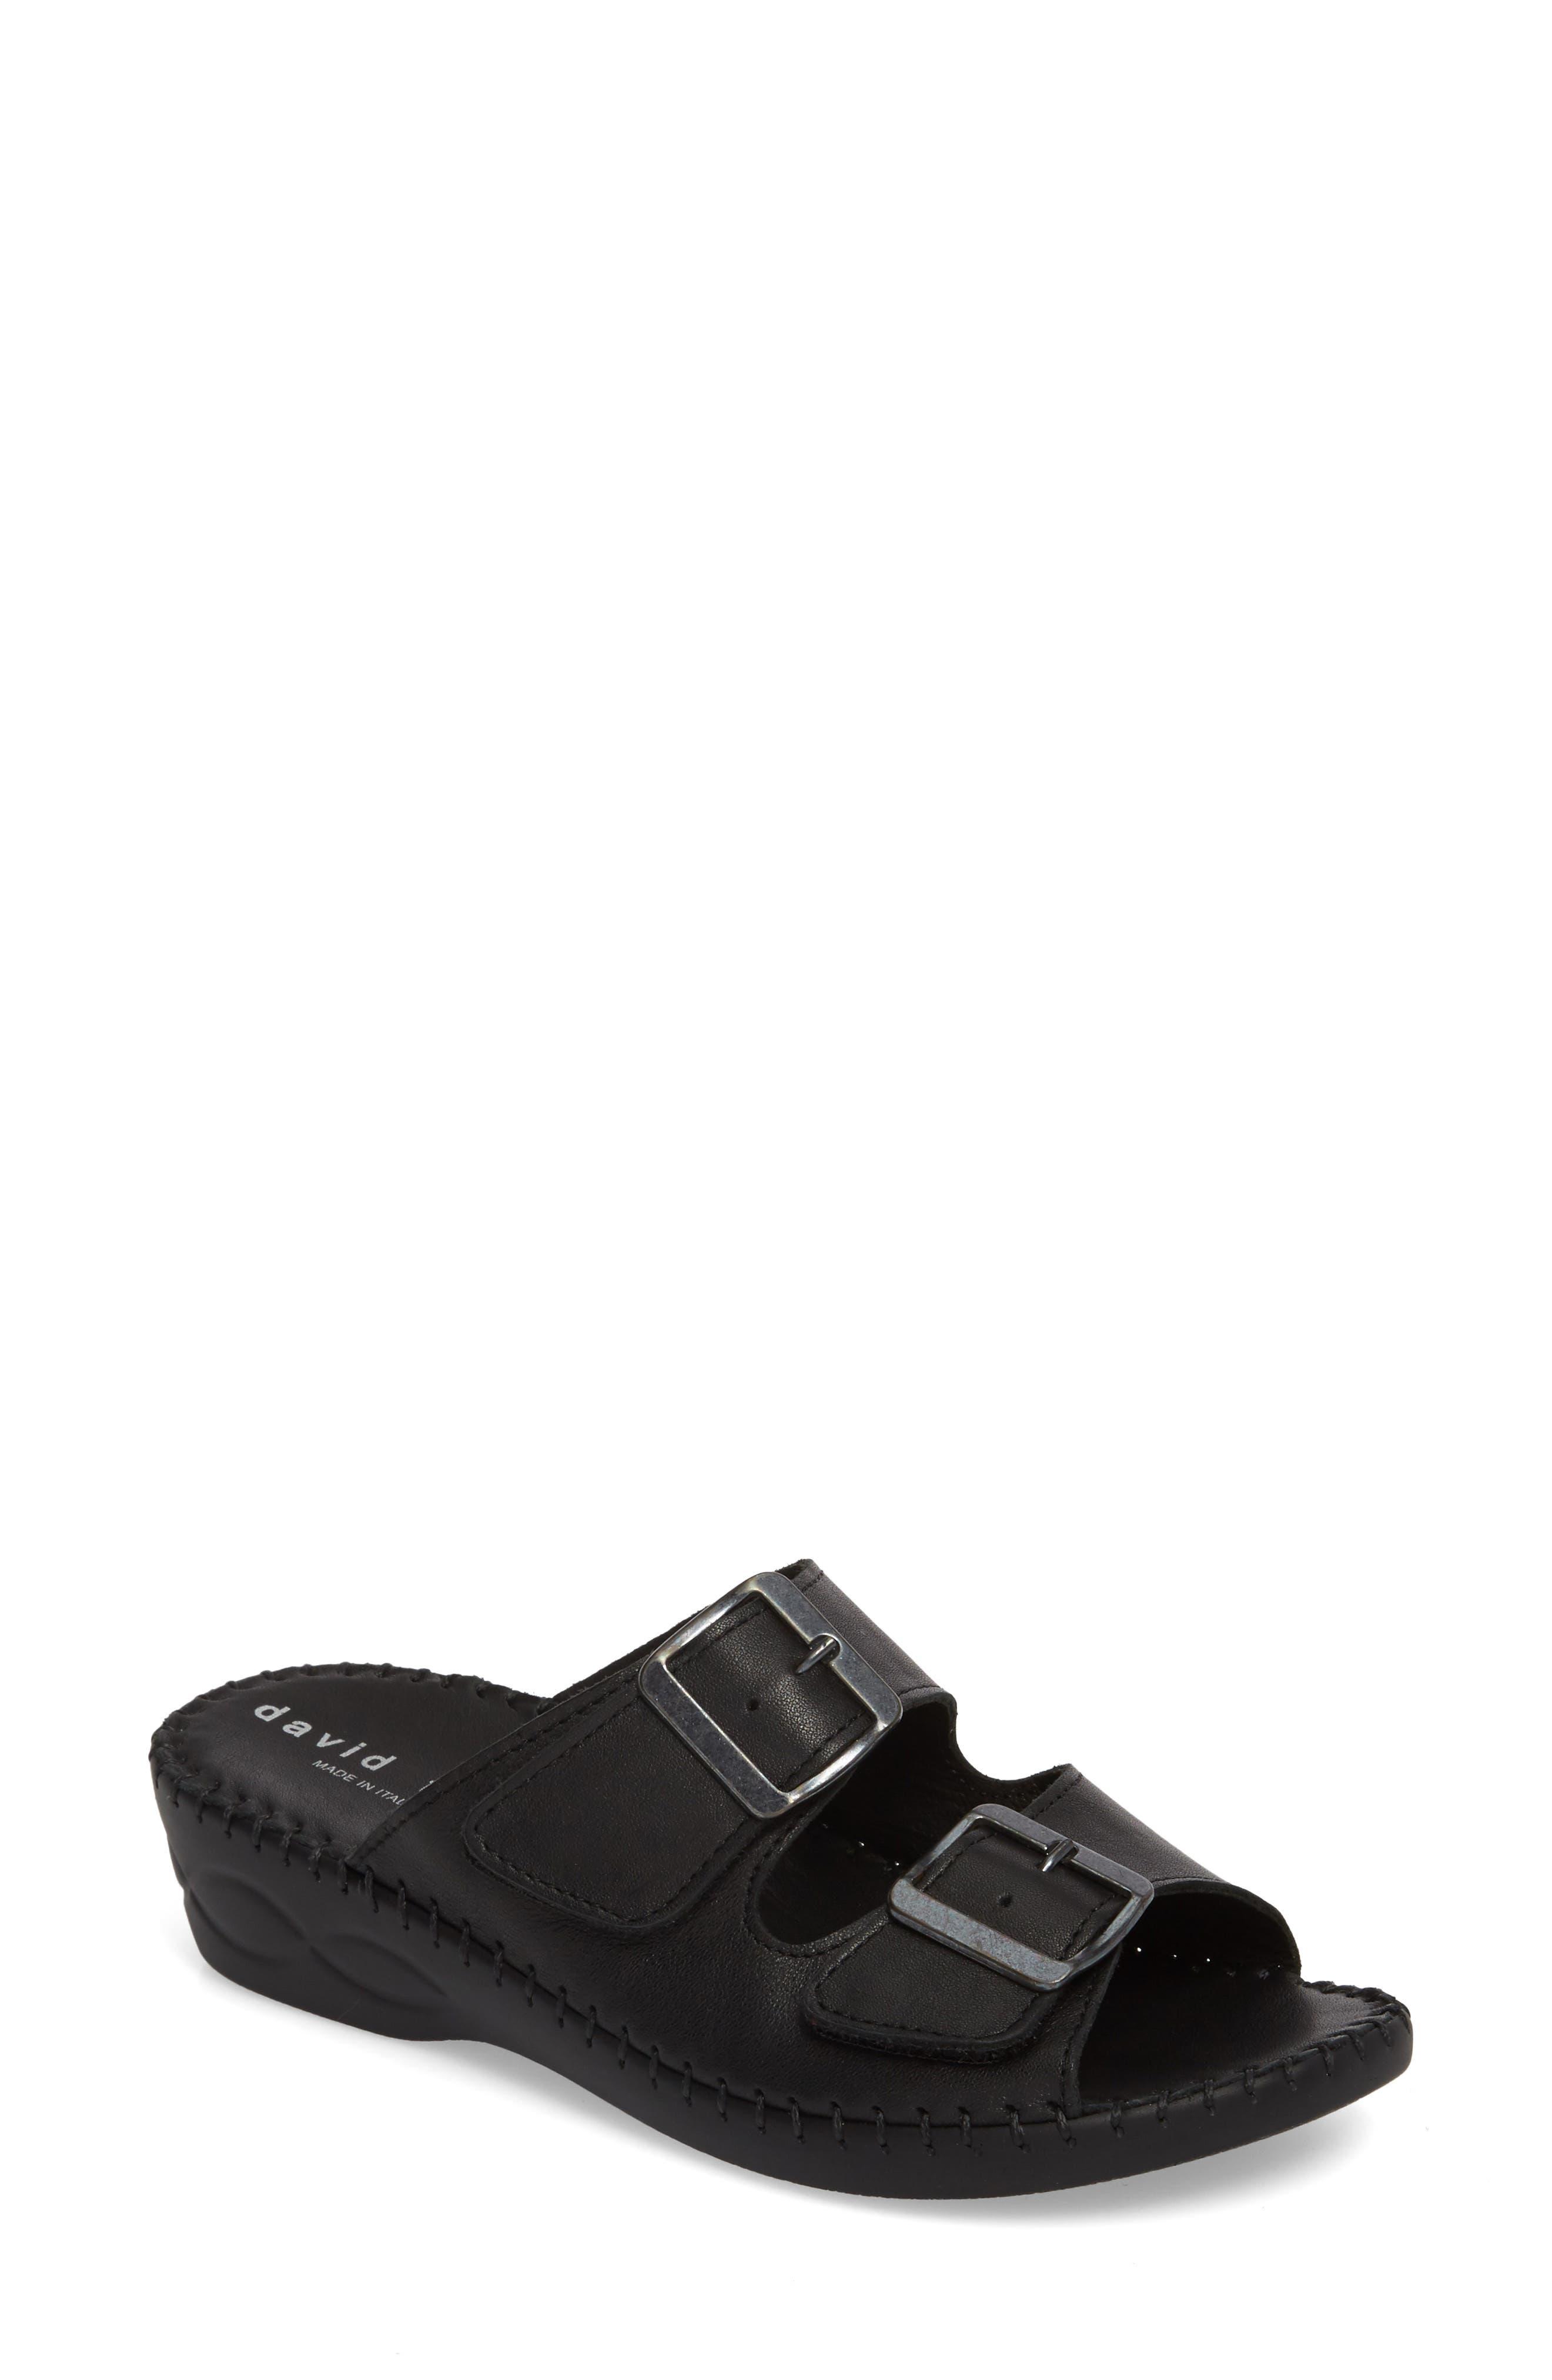 Sol Sandal,                         Main,                         color, BLACK LEATHER